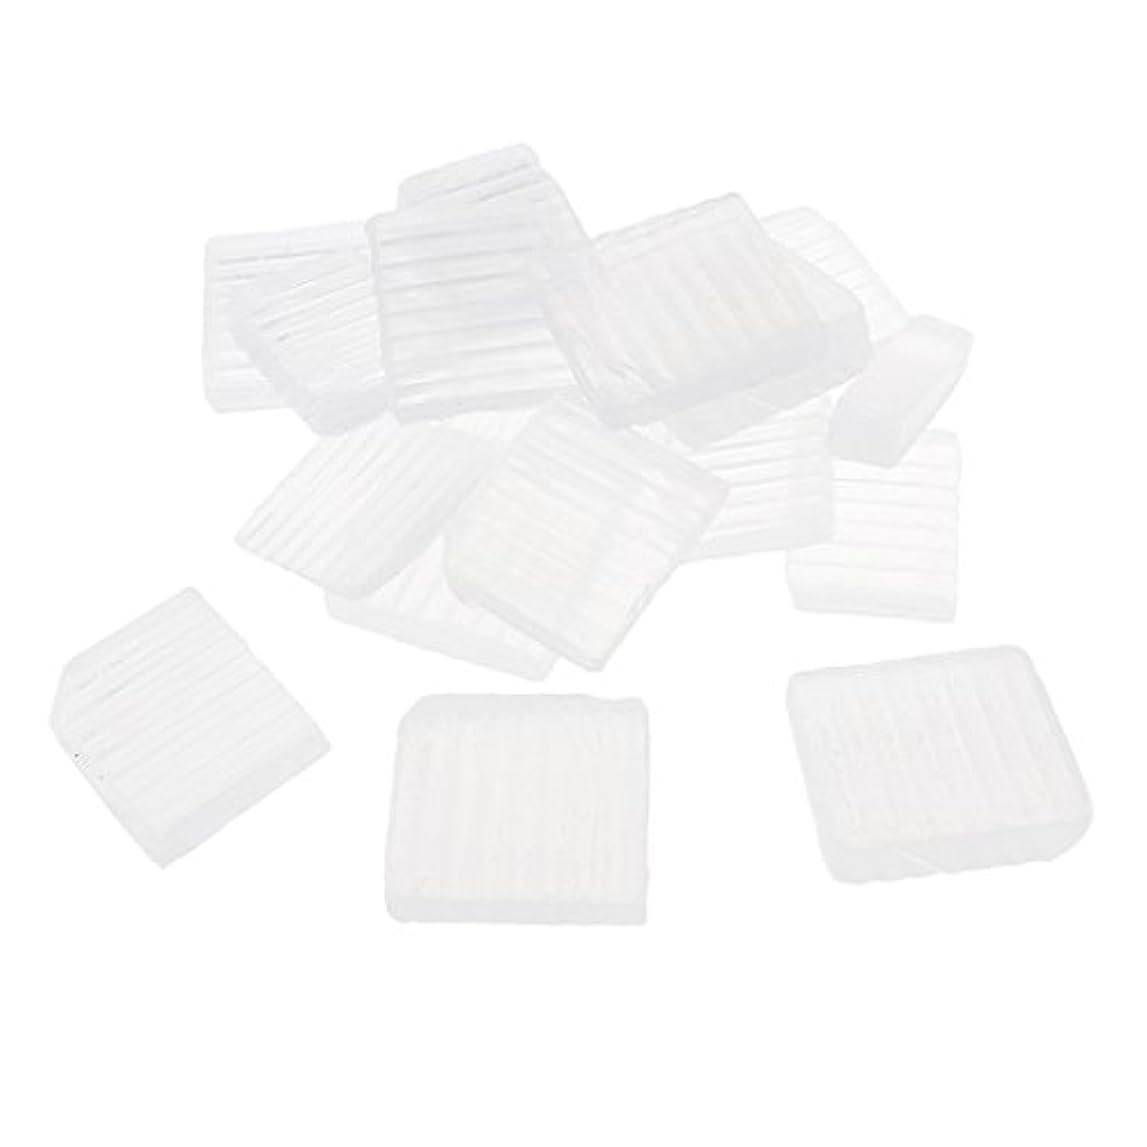 Hellery 石鹸ベース DIY 石鹸作り プアソープベース 石鹸クラフト 手作り 約1 KG